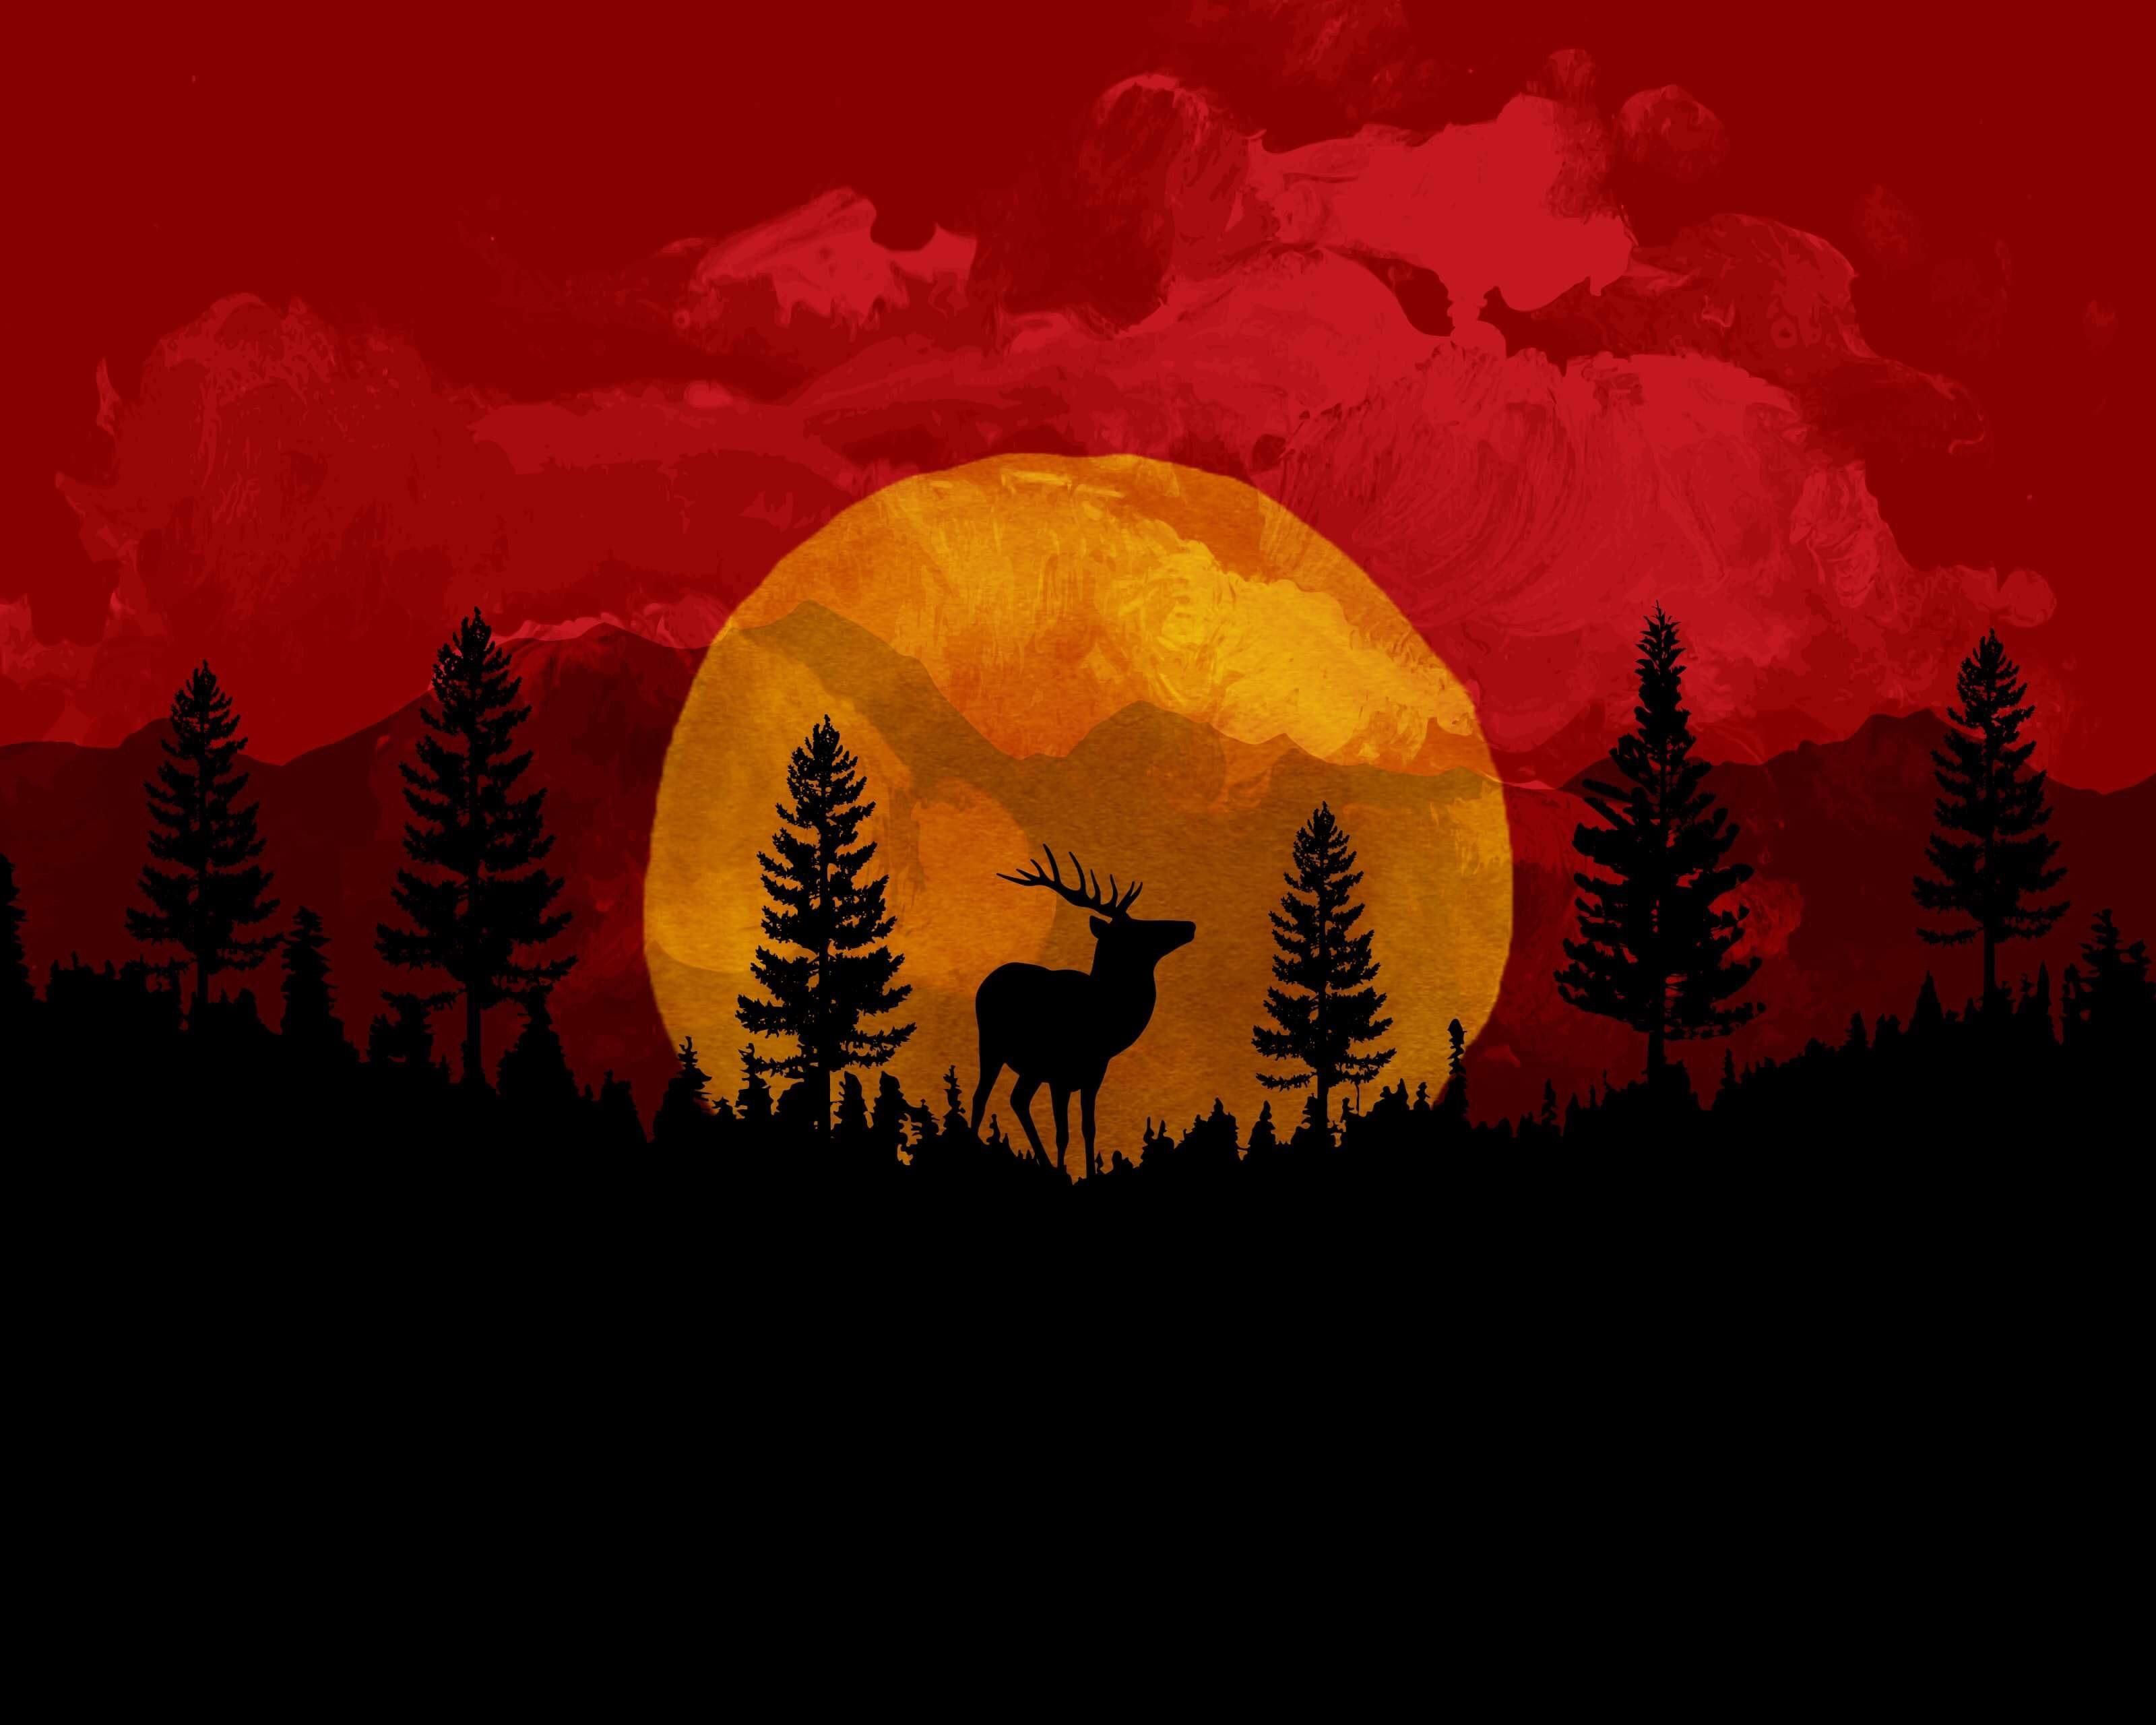 Red Red Dead Redemption Red Dead Redemption Ii Red Dead Redemption 1